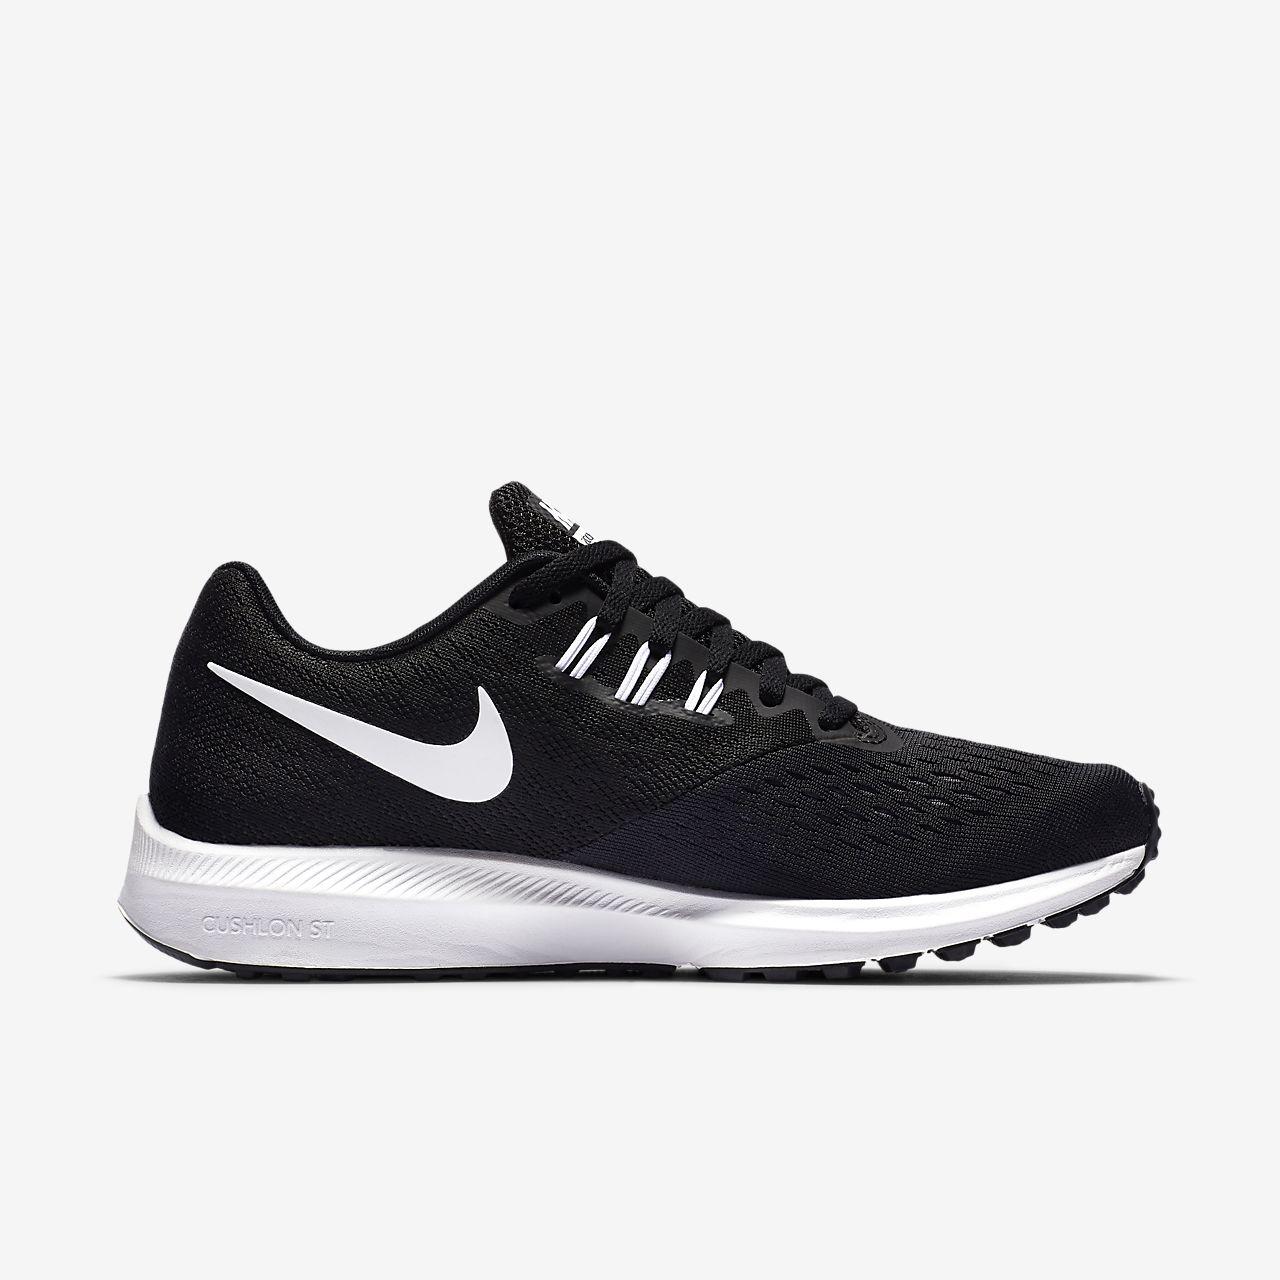 ... Nike Zoom Winflo 4 Women's Running Shoe